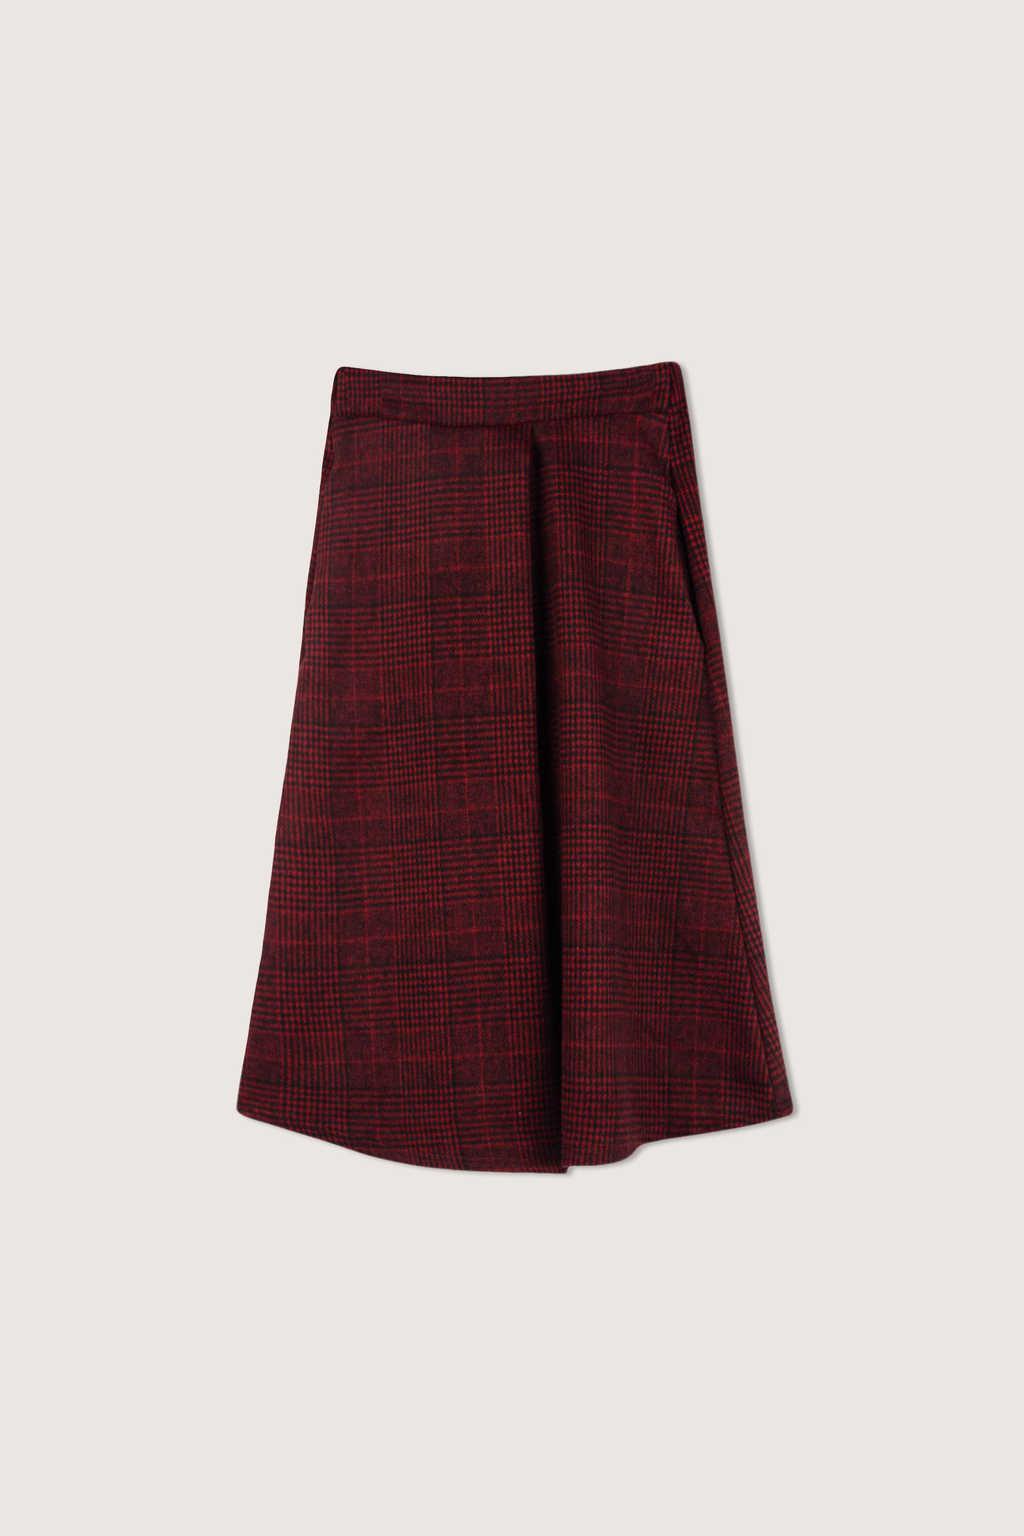 Skirt H177 Red 7